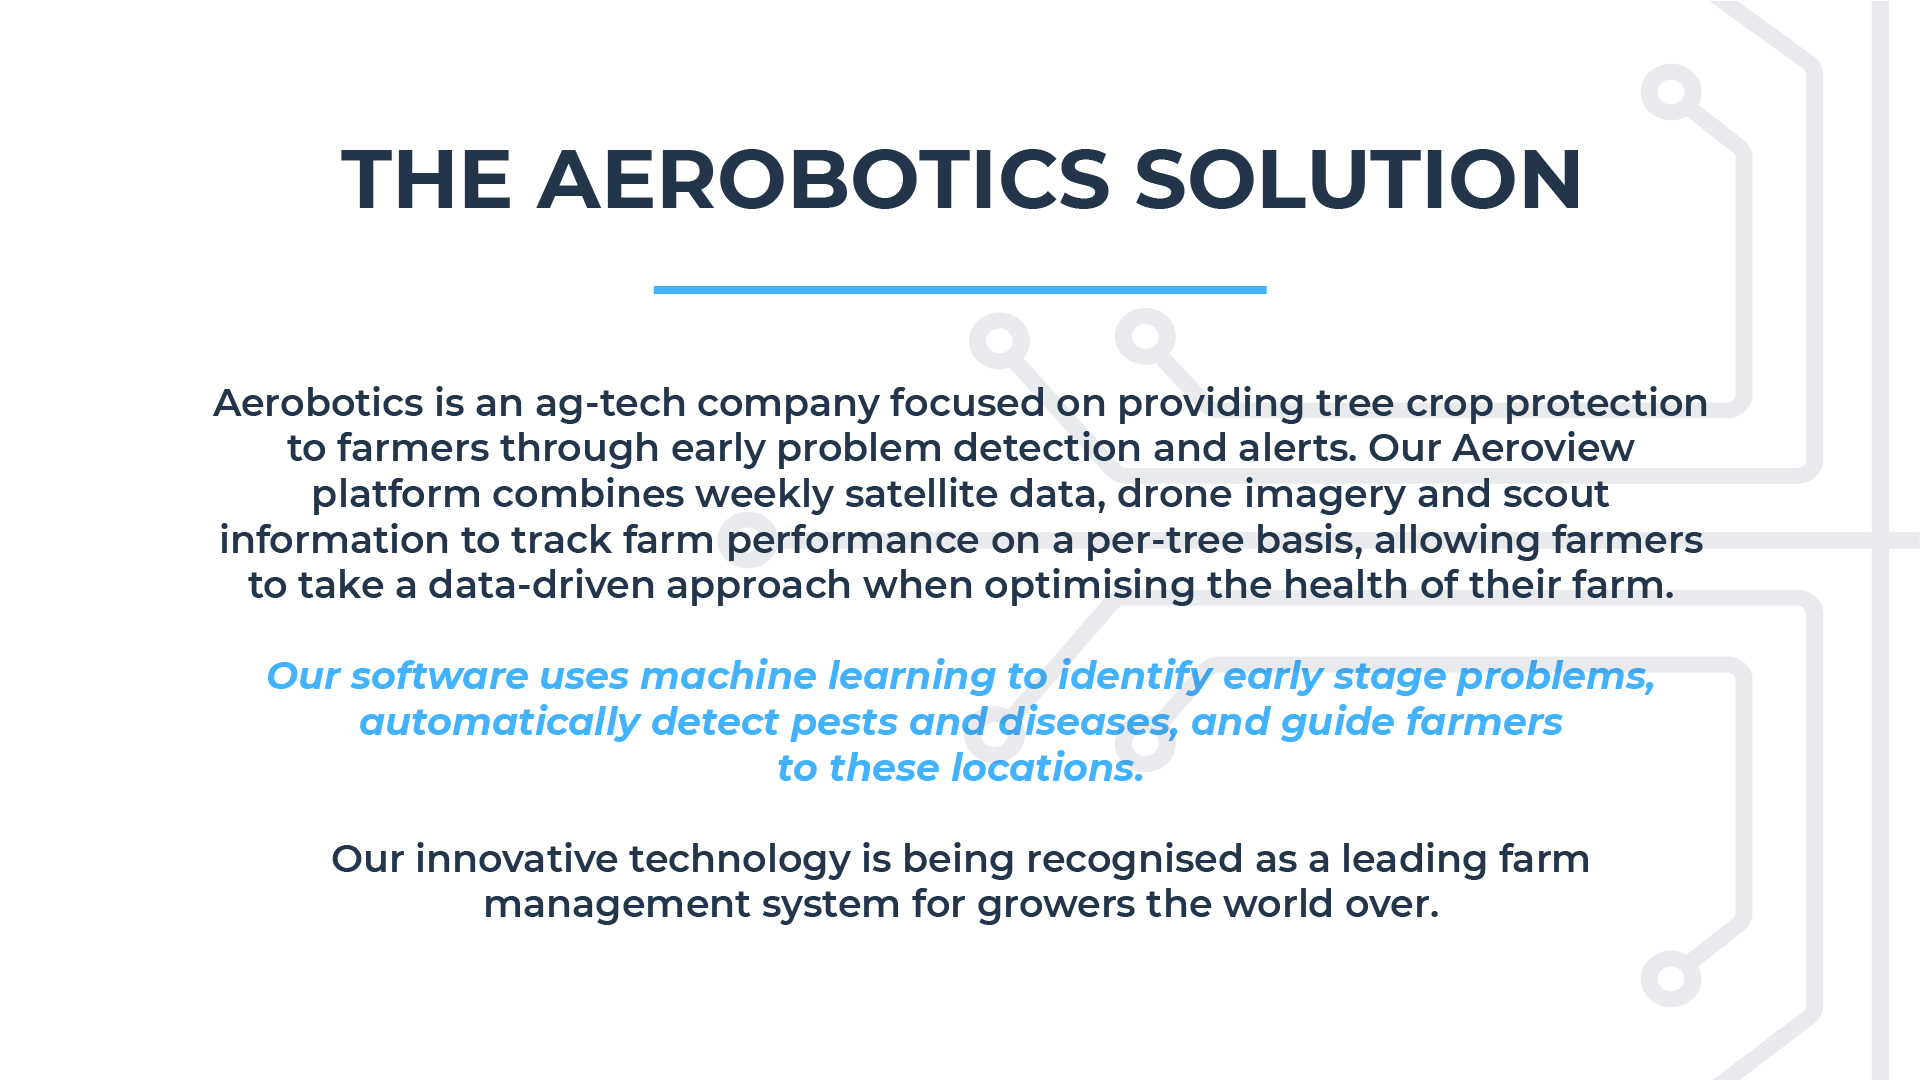 Aerobotics solution-03.jpg